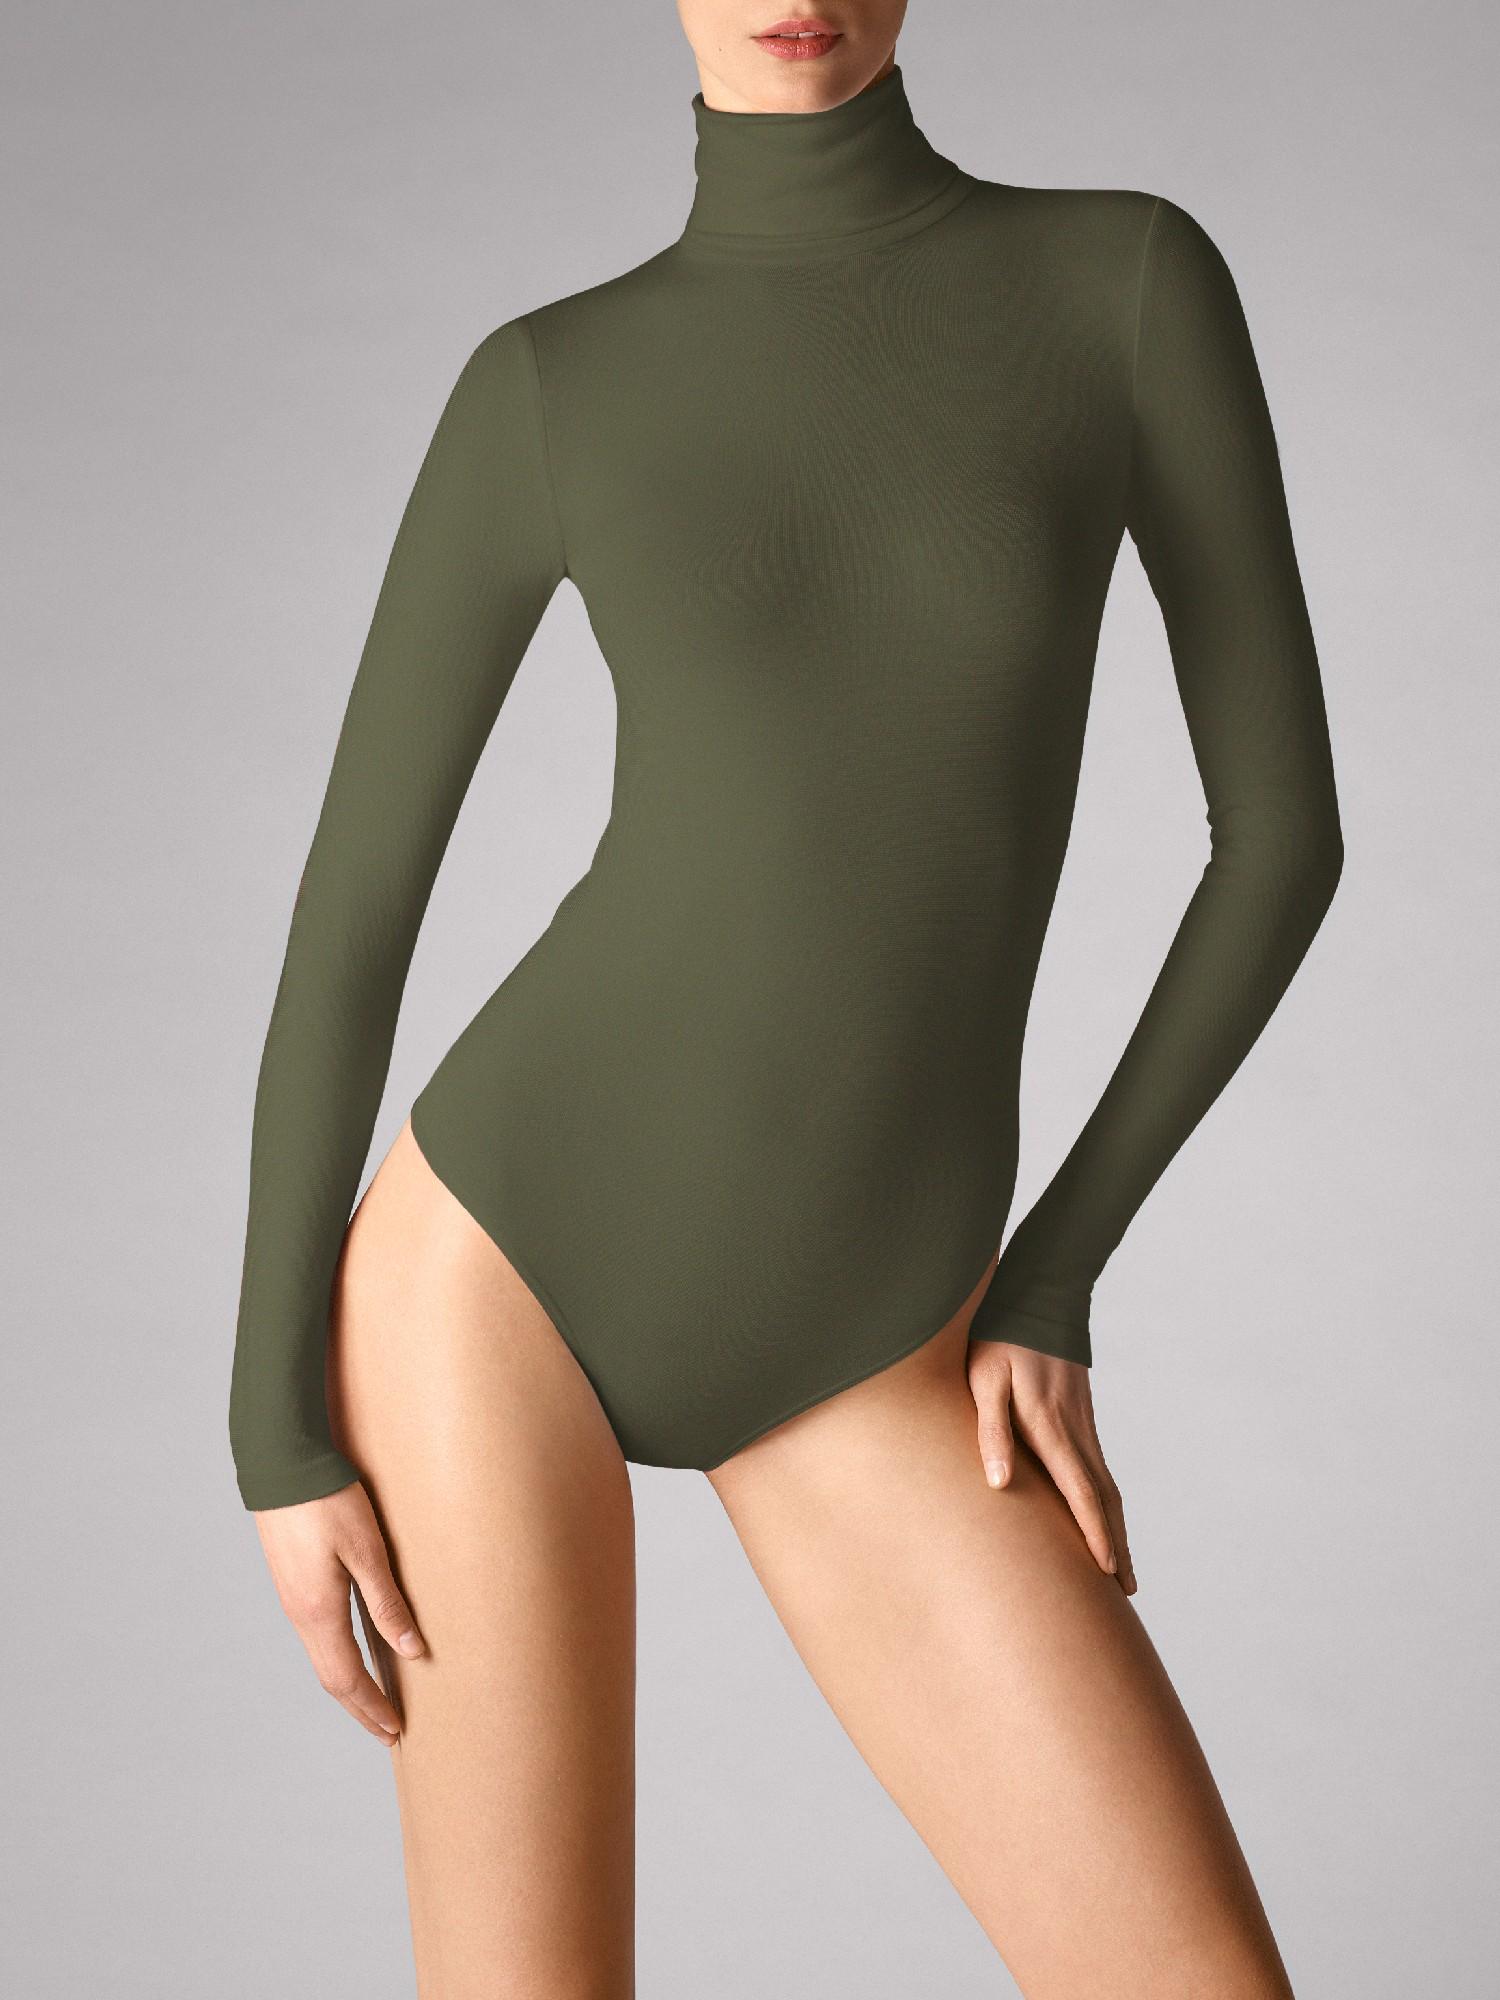 Боди-свитера colorado string body фото